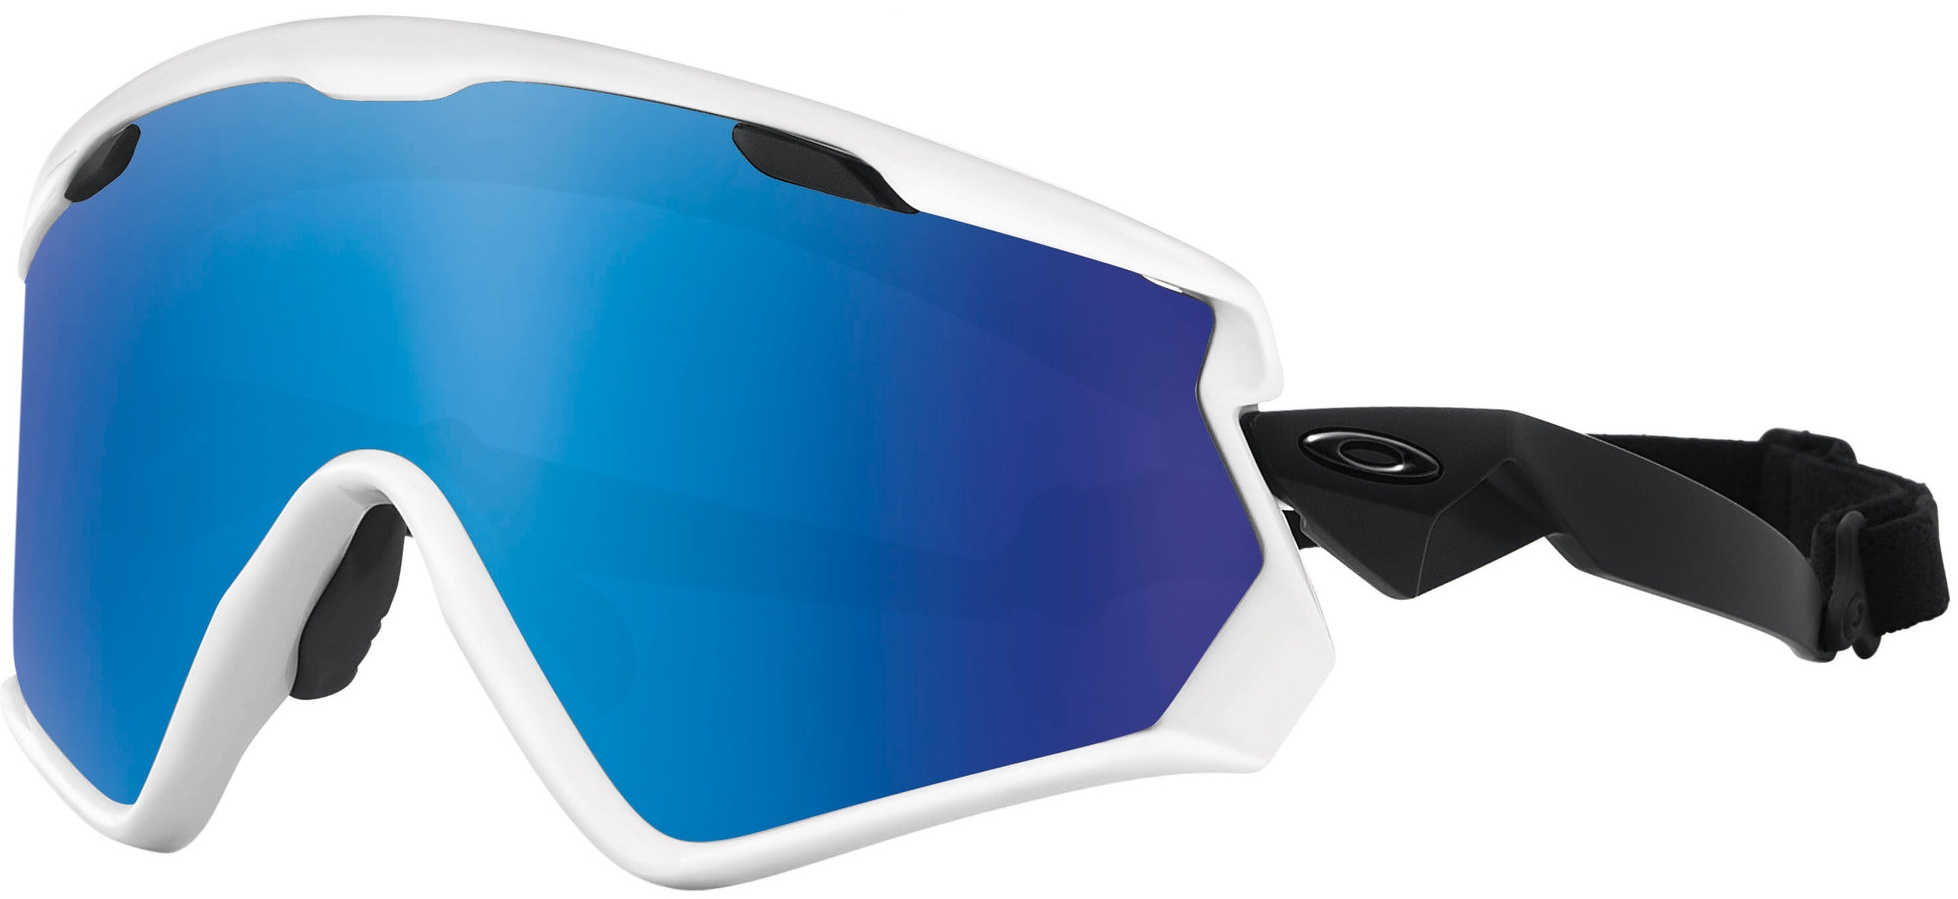 Oakley WIND JACKET™ 2.0 PRIZM™ Snow Goggles, $150